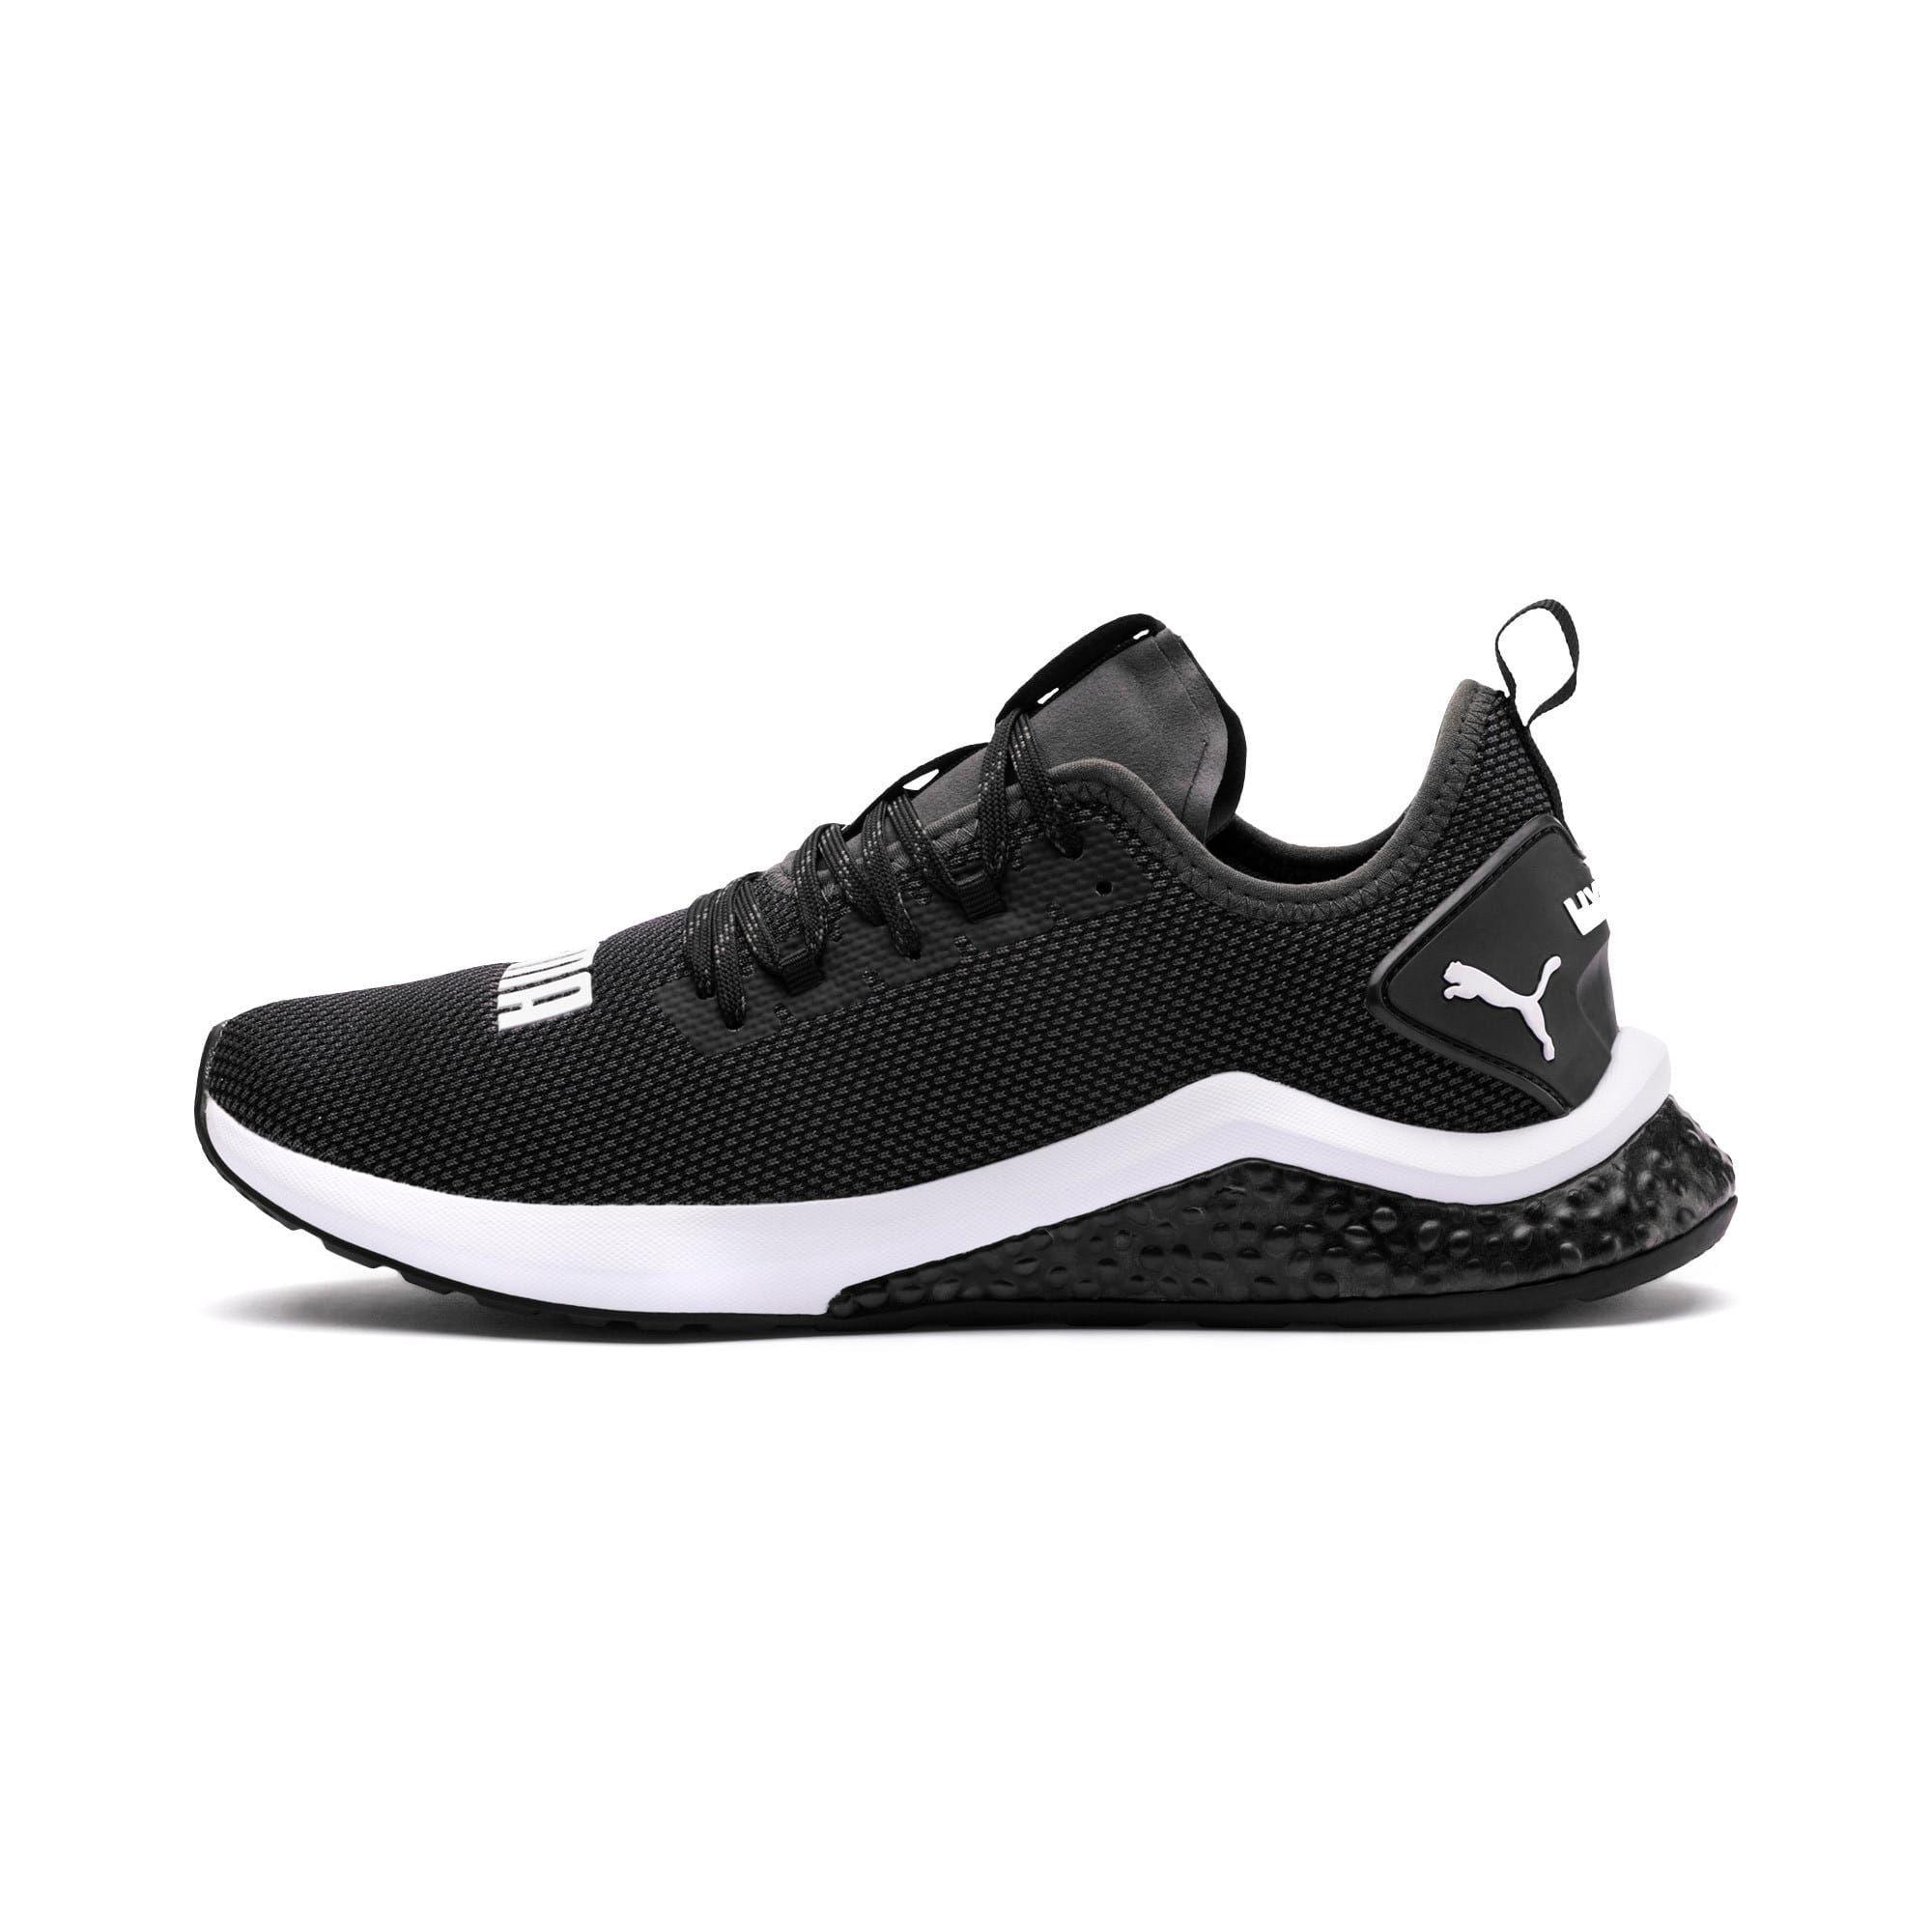 PUMA Hybrid Nx Mens Running Shoes in BlackWhite size 115